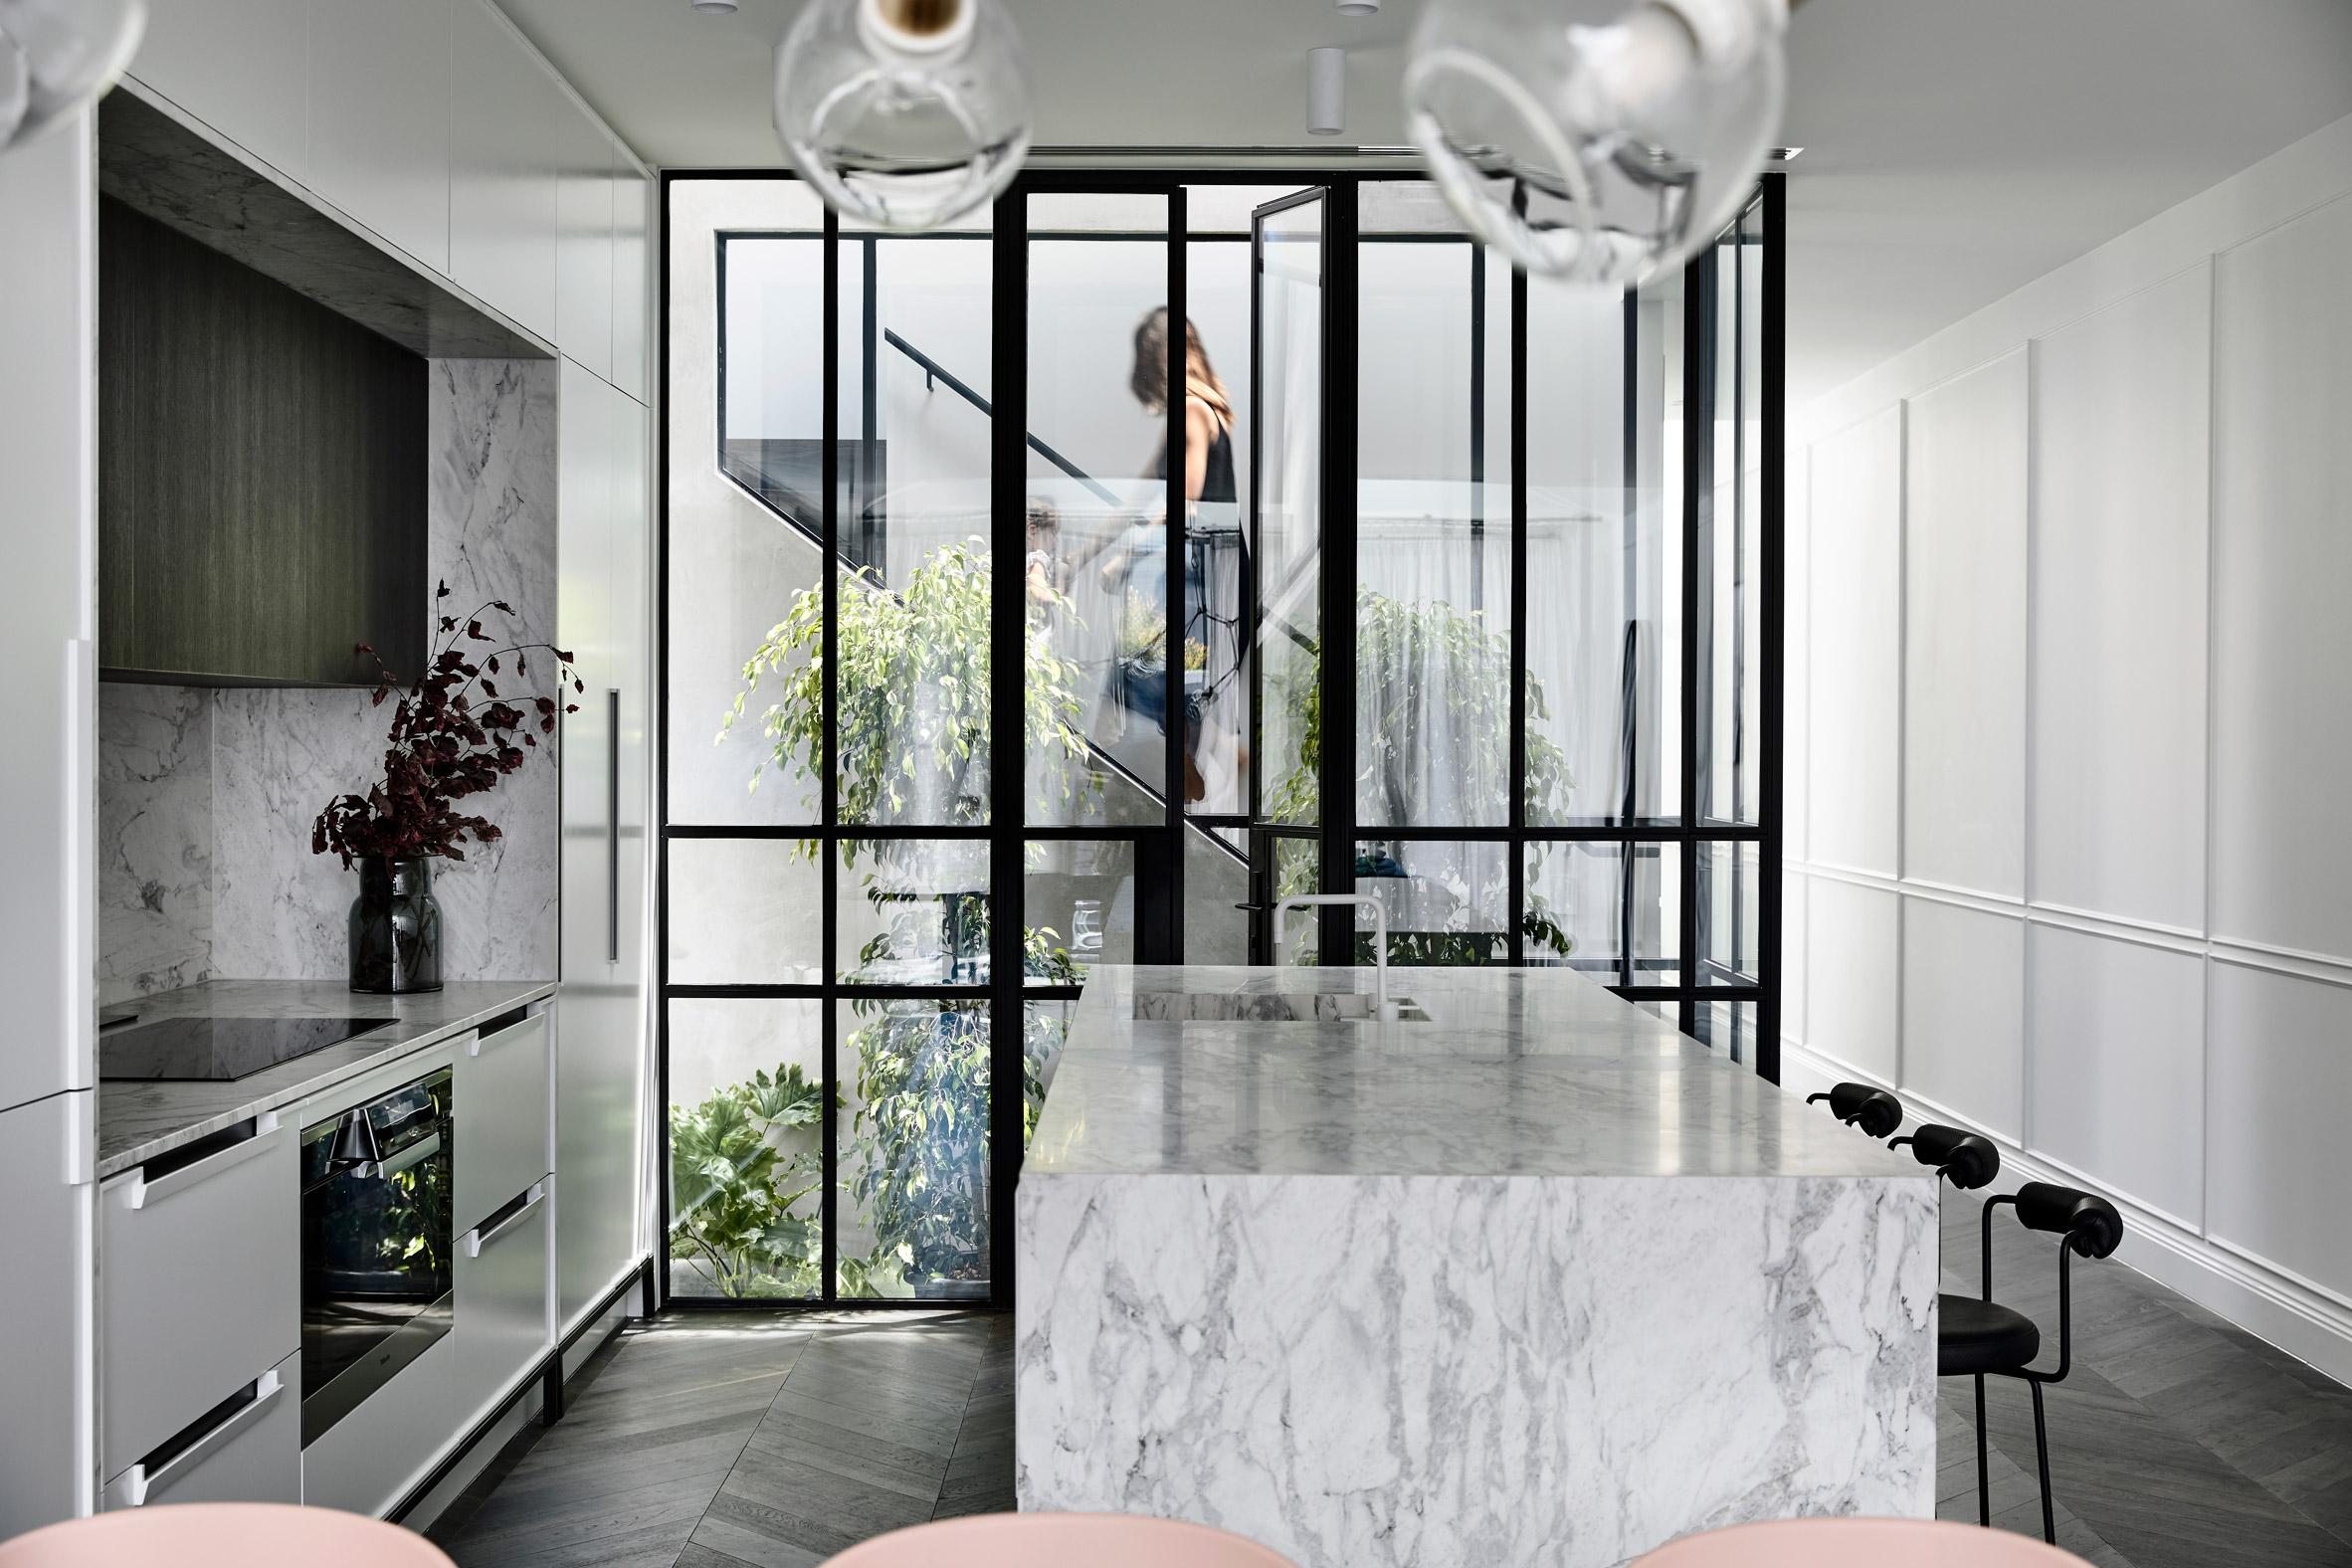 Interiors of Casa Atrio, designed by Biasol